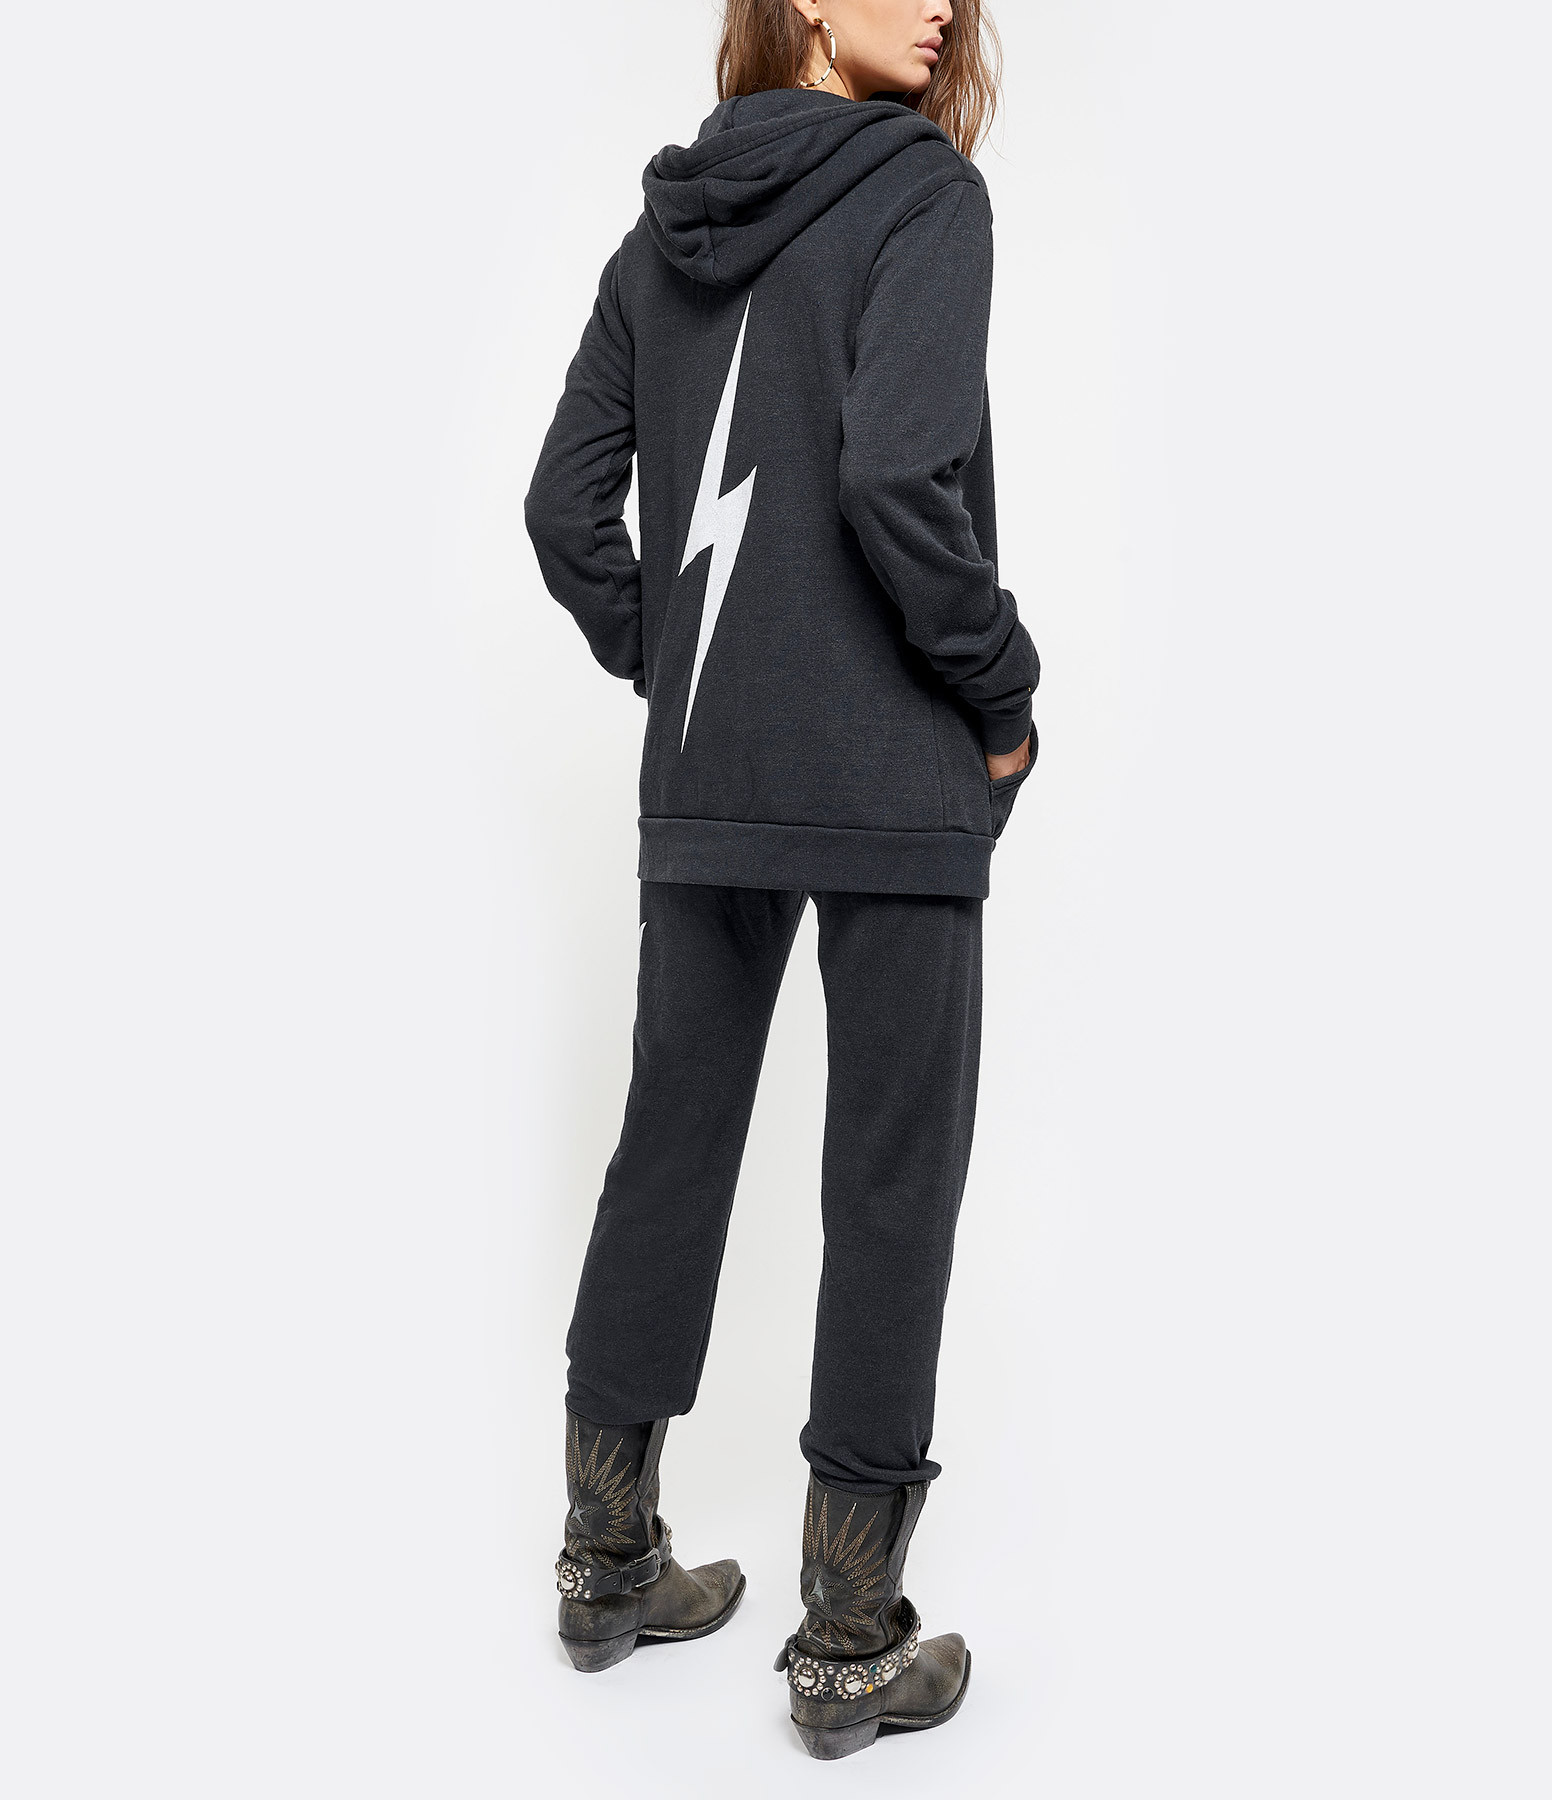 AVIATOR NATION - Sweatshirt Bolt Coton Charbon Blanc